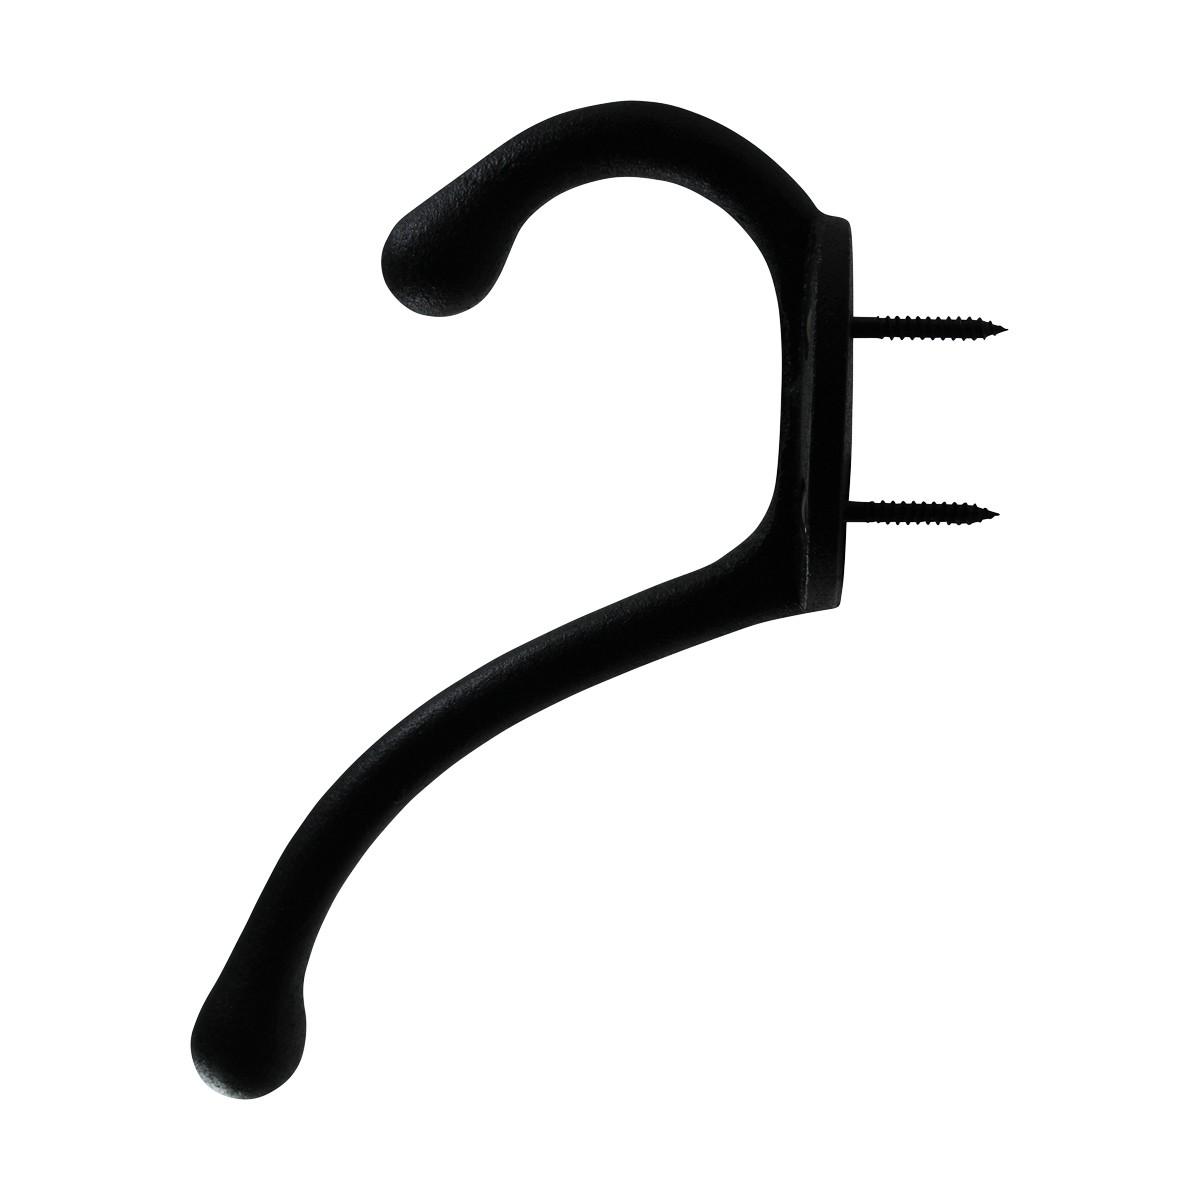 6 Hook Wrought Iron Black Cast RSF 5 12H X 3 34 Proj Hooks Decorative Hook Coat Hook